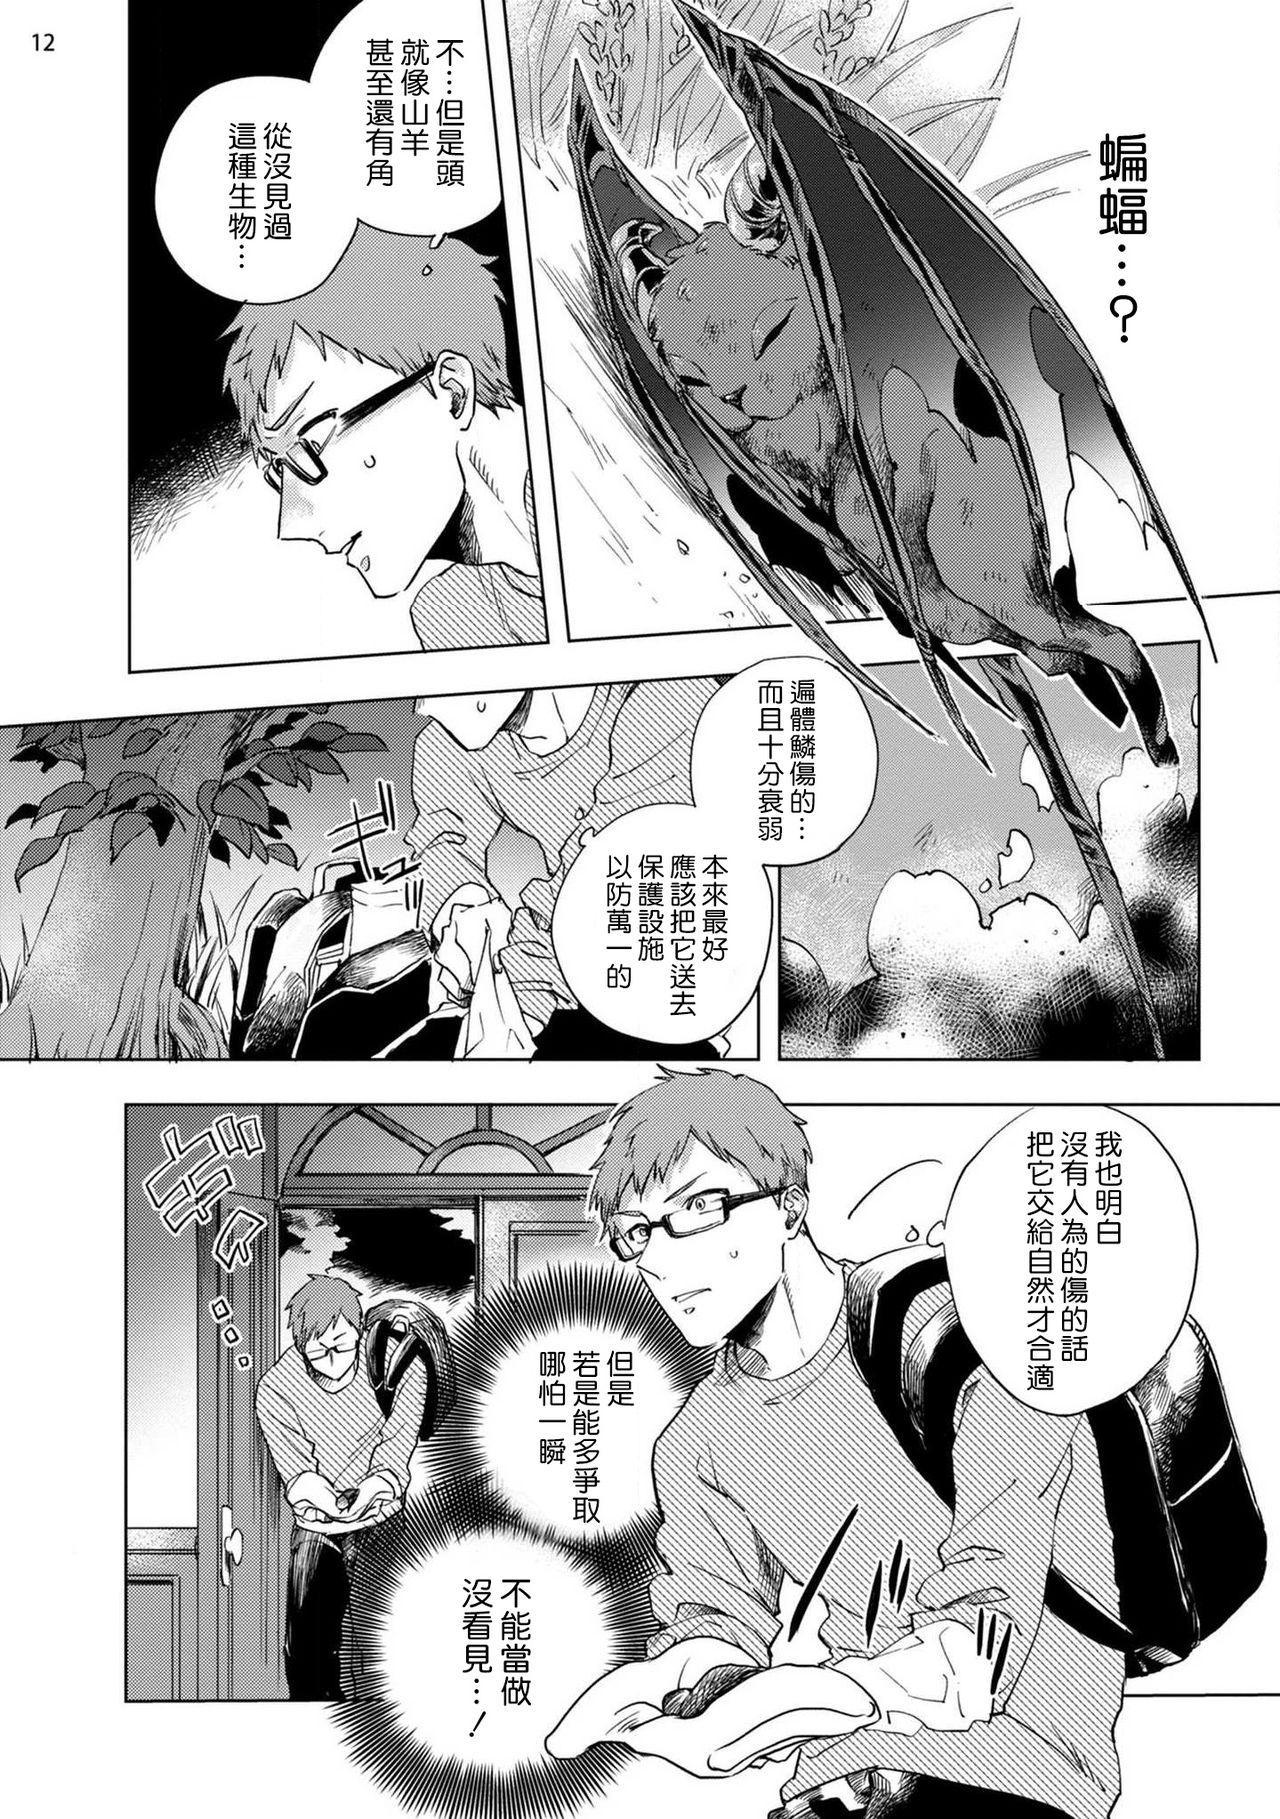 [Yao] Inma-sama ni Hallelujah!   赞美淫魔大人! Ch. 1-3 [Chinese] [拾荒者汉化组] [Digital] 12